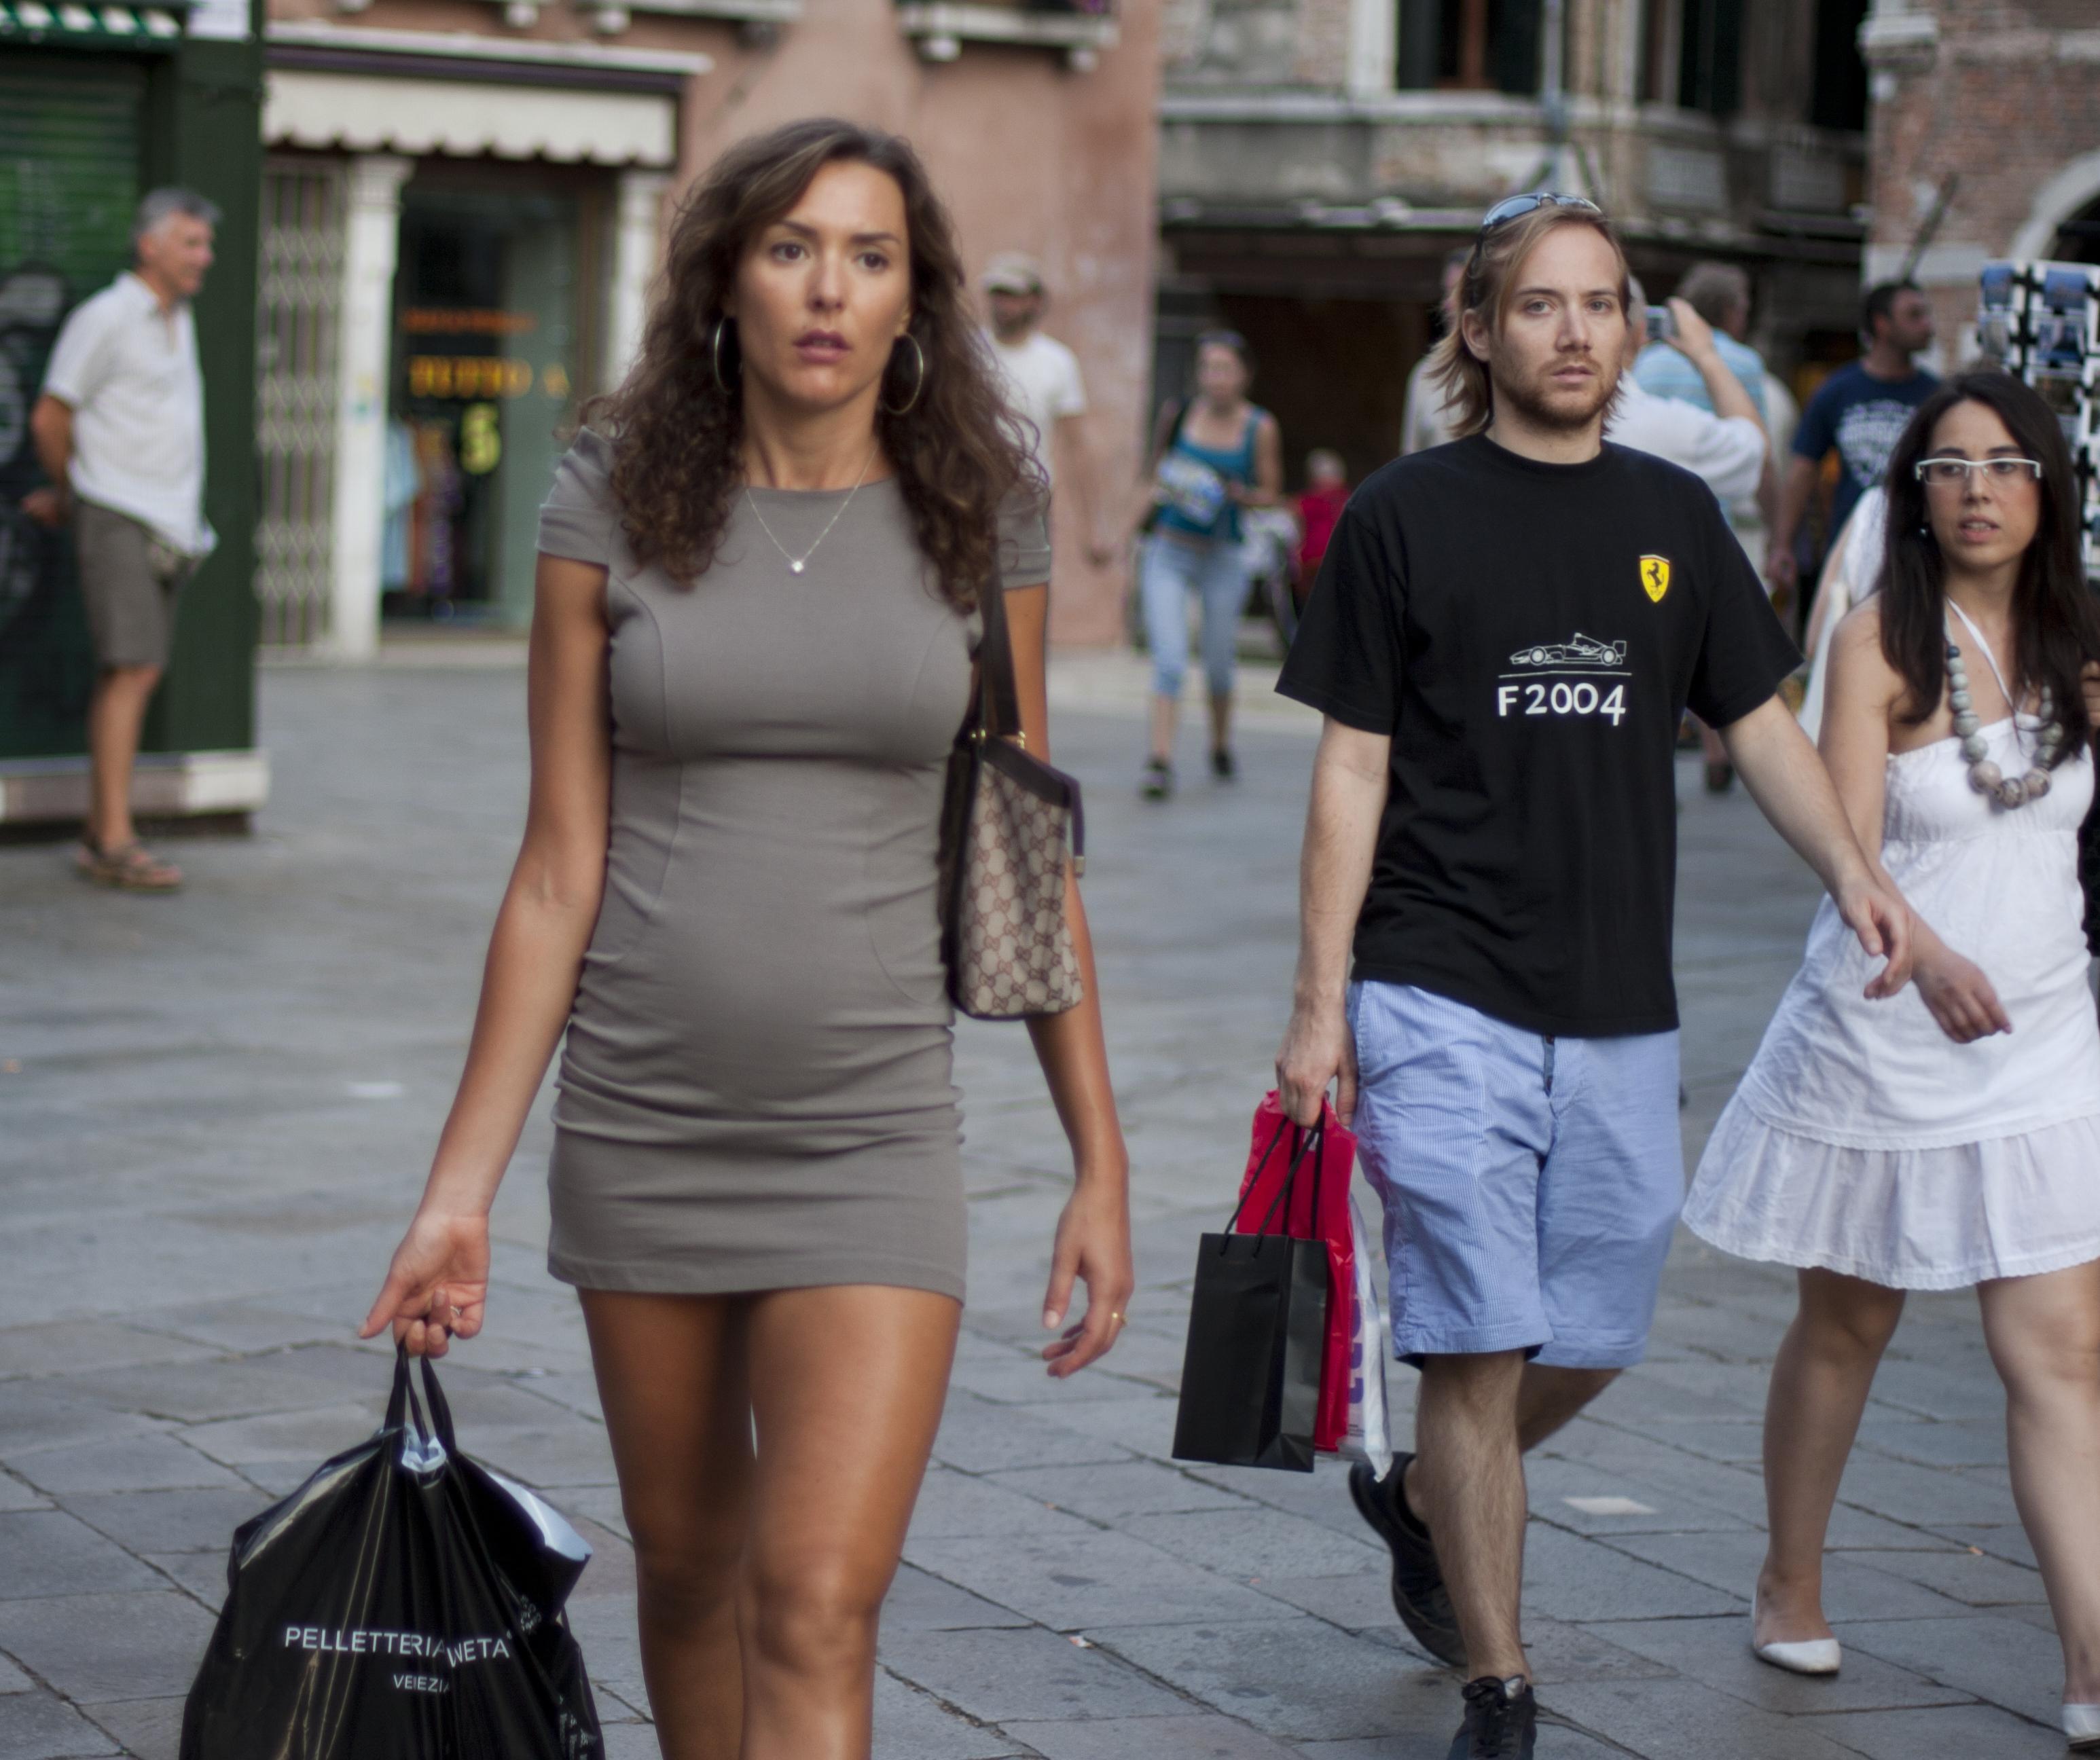 gay escort nancy tv escort stockholm